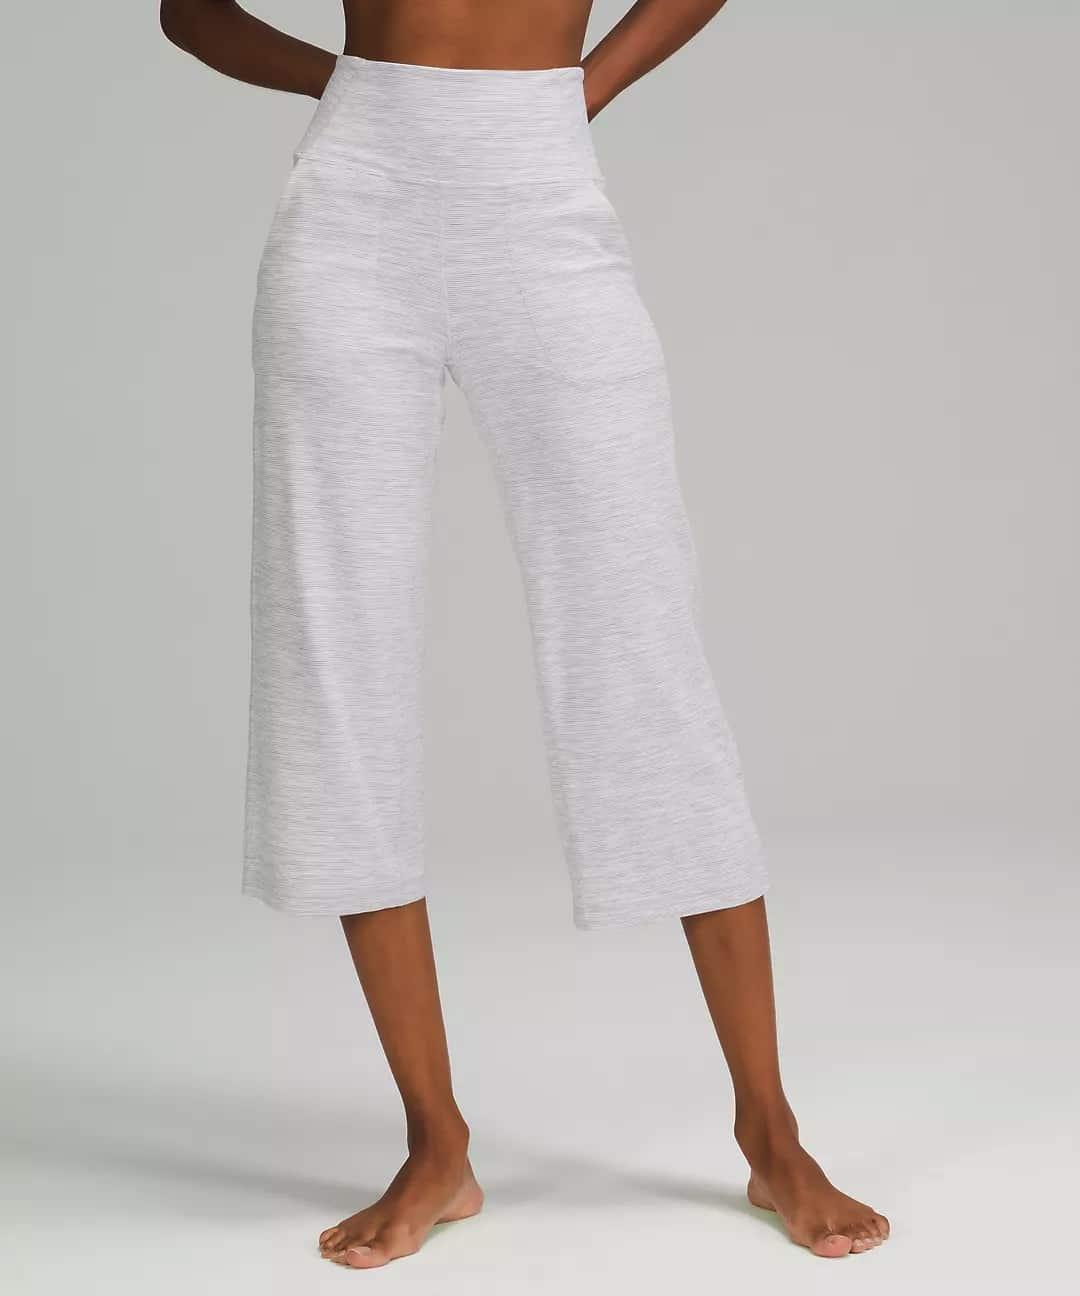 Align Wide Leg Crop | Women's Capris | lululemon